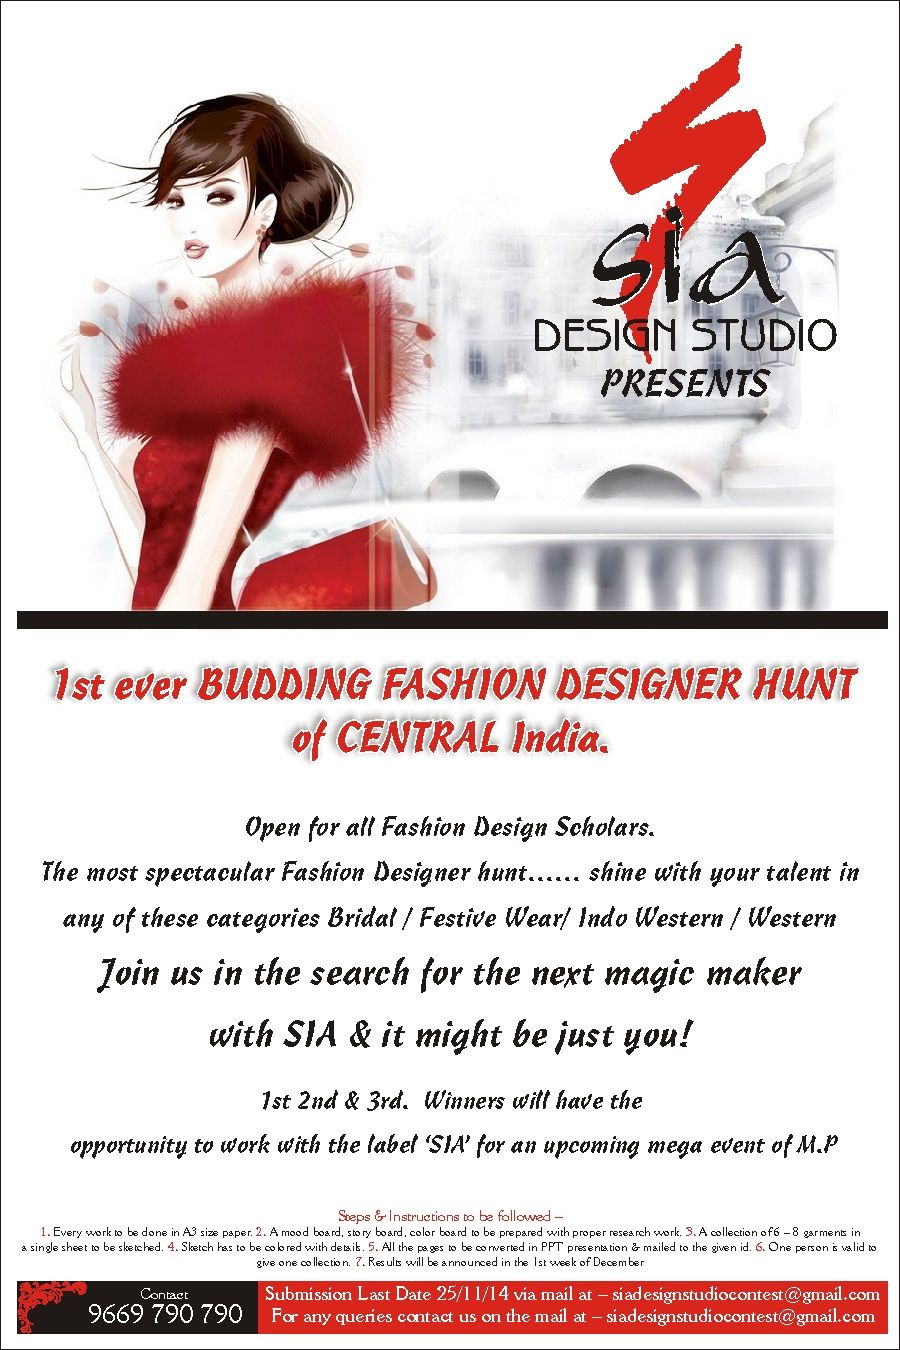 Sia Design Studio Launches Central India S First Fashion Designer Hunt Design Studio Fashion Design Design